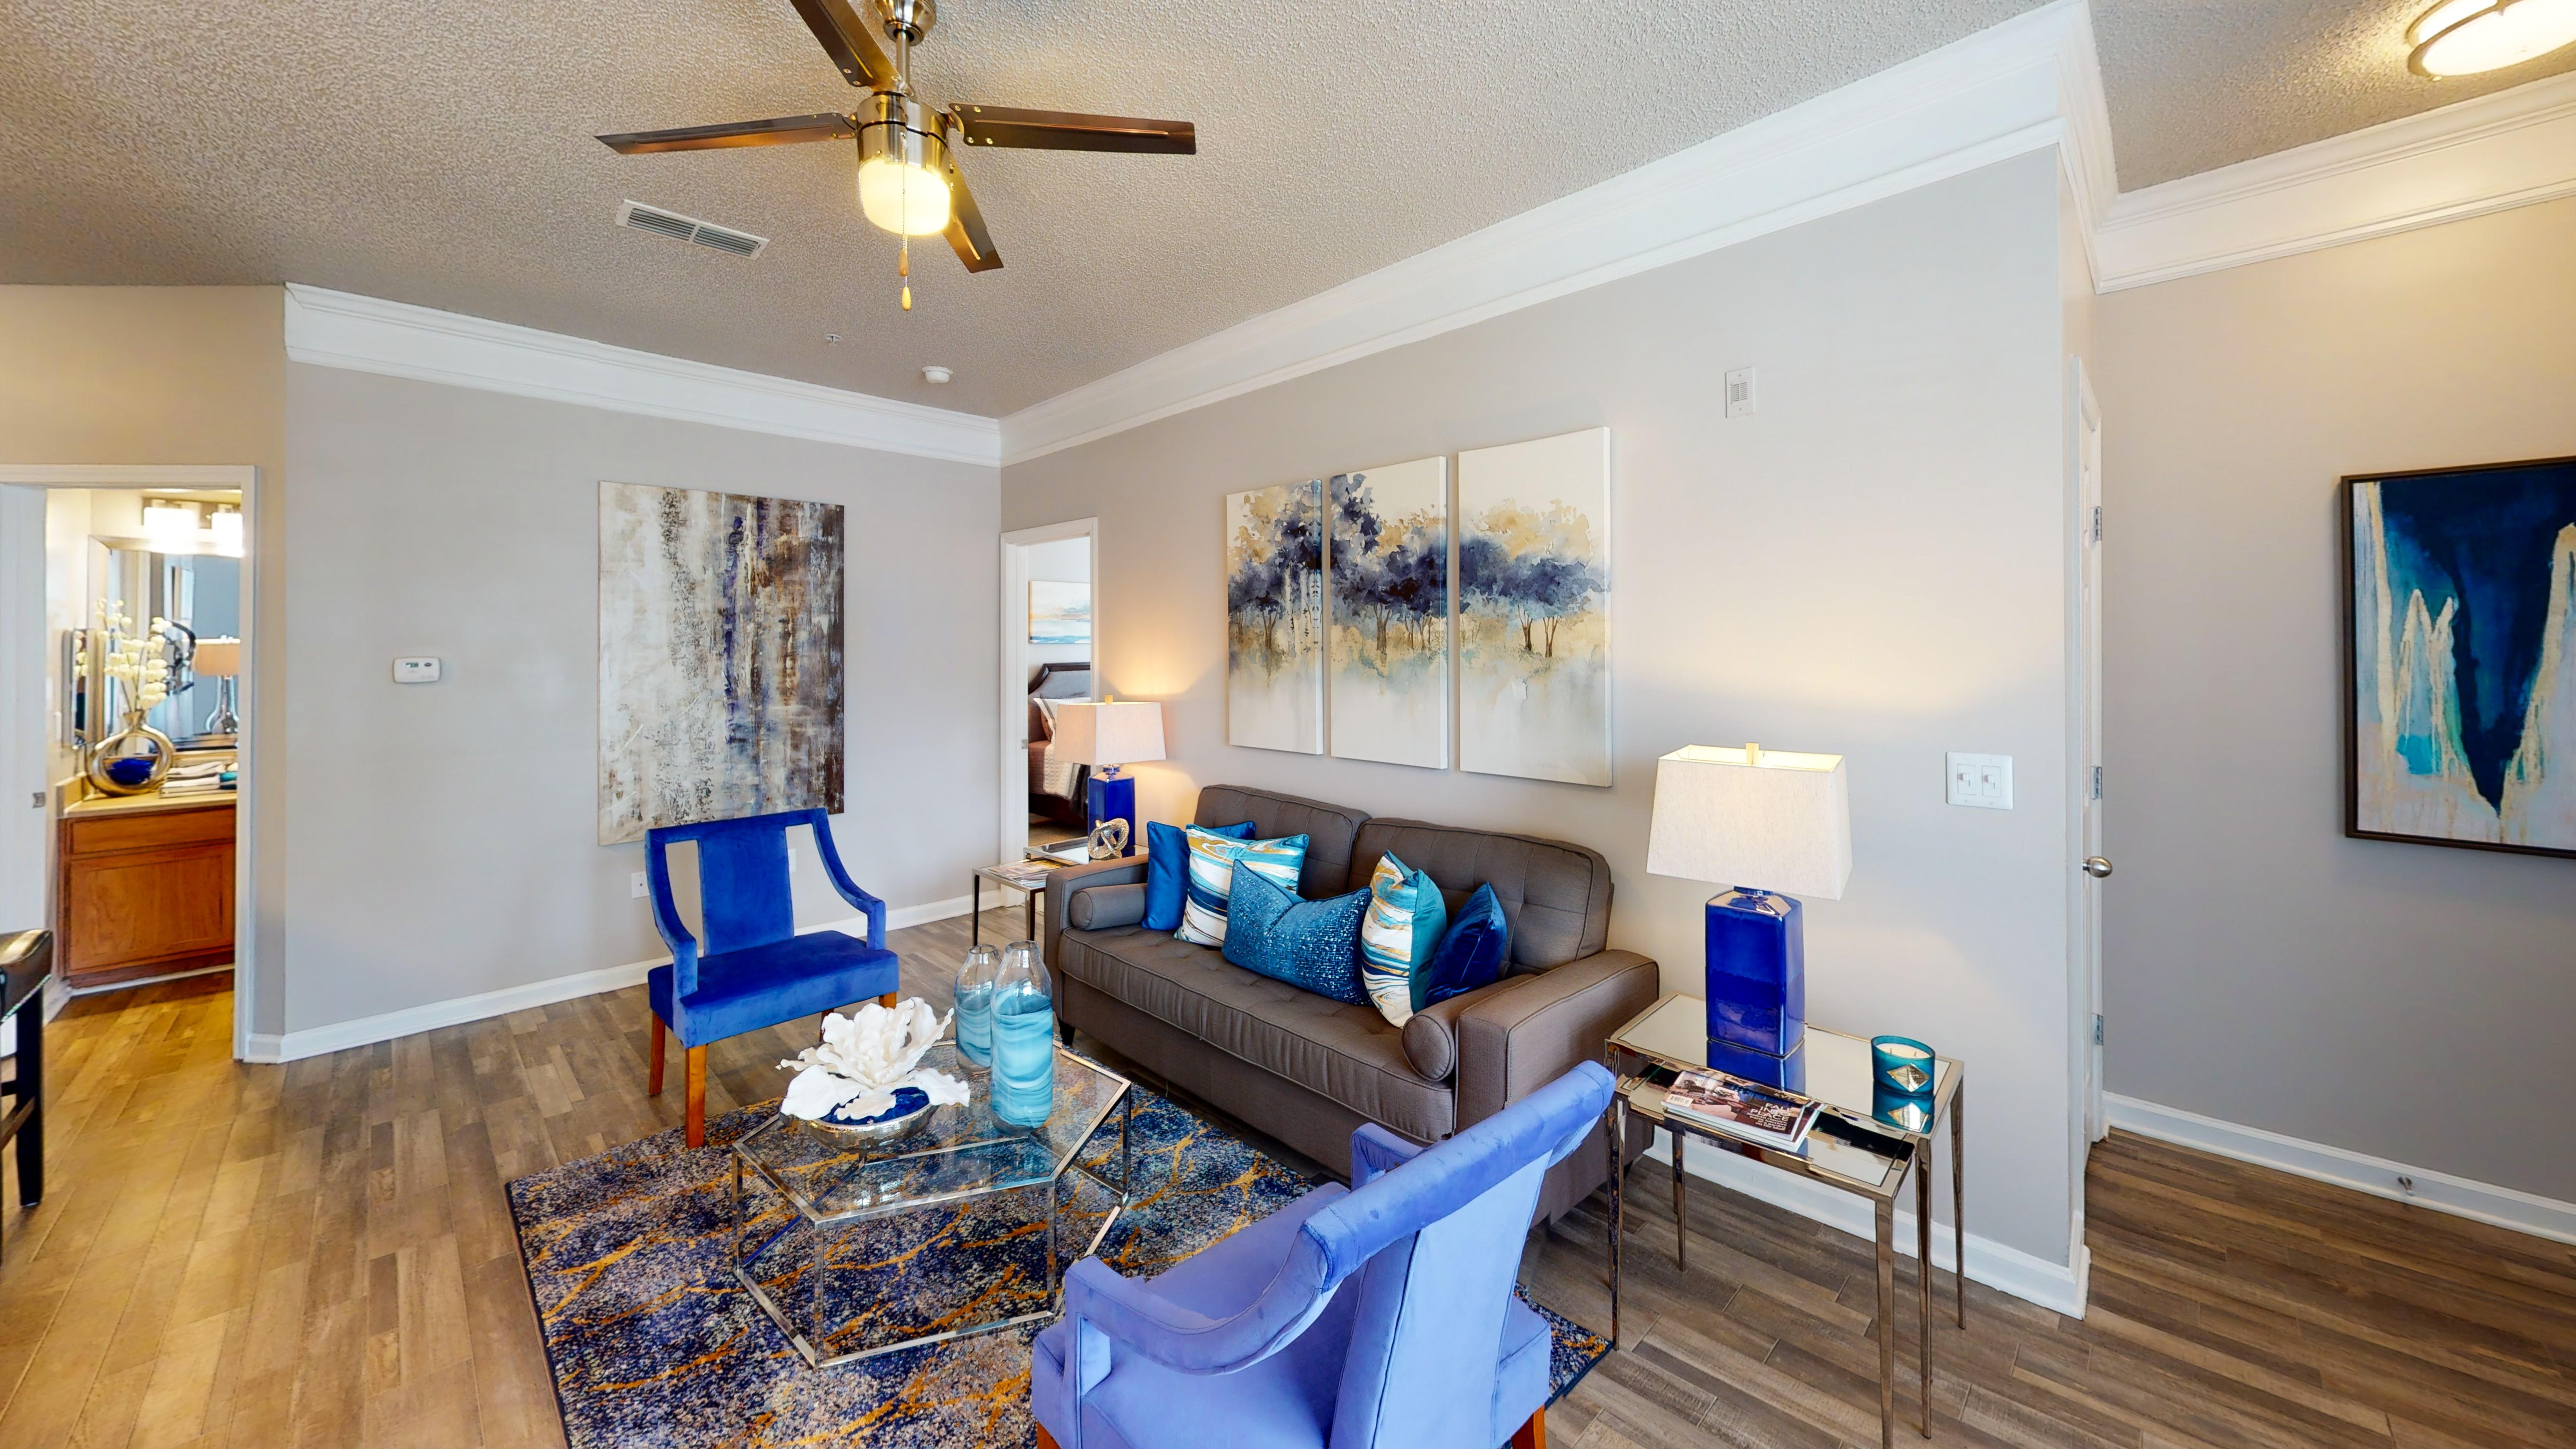 Apartments Near AASU Olympus Fenwick for Armstrong Atlantic State University Students in Savannah, GA